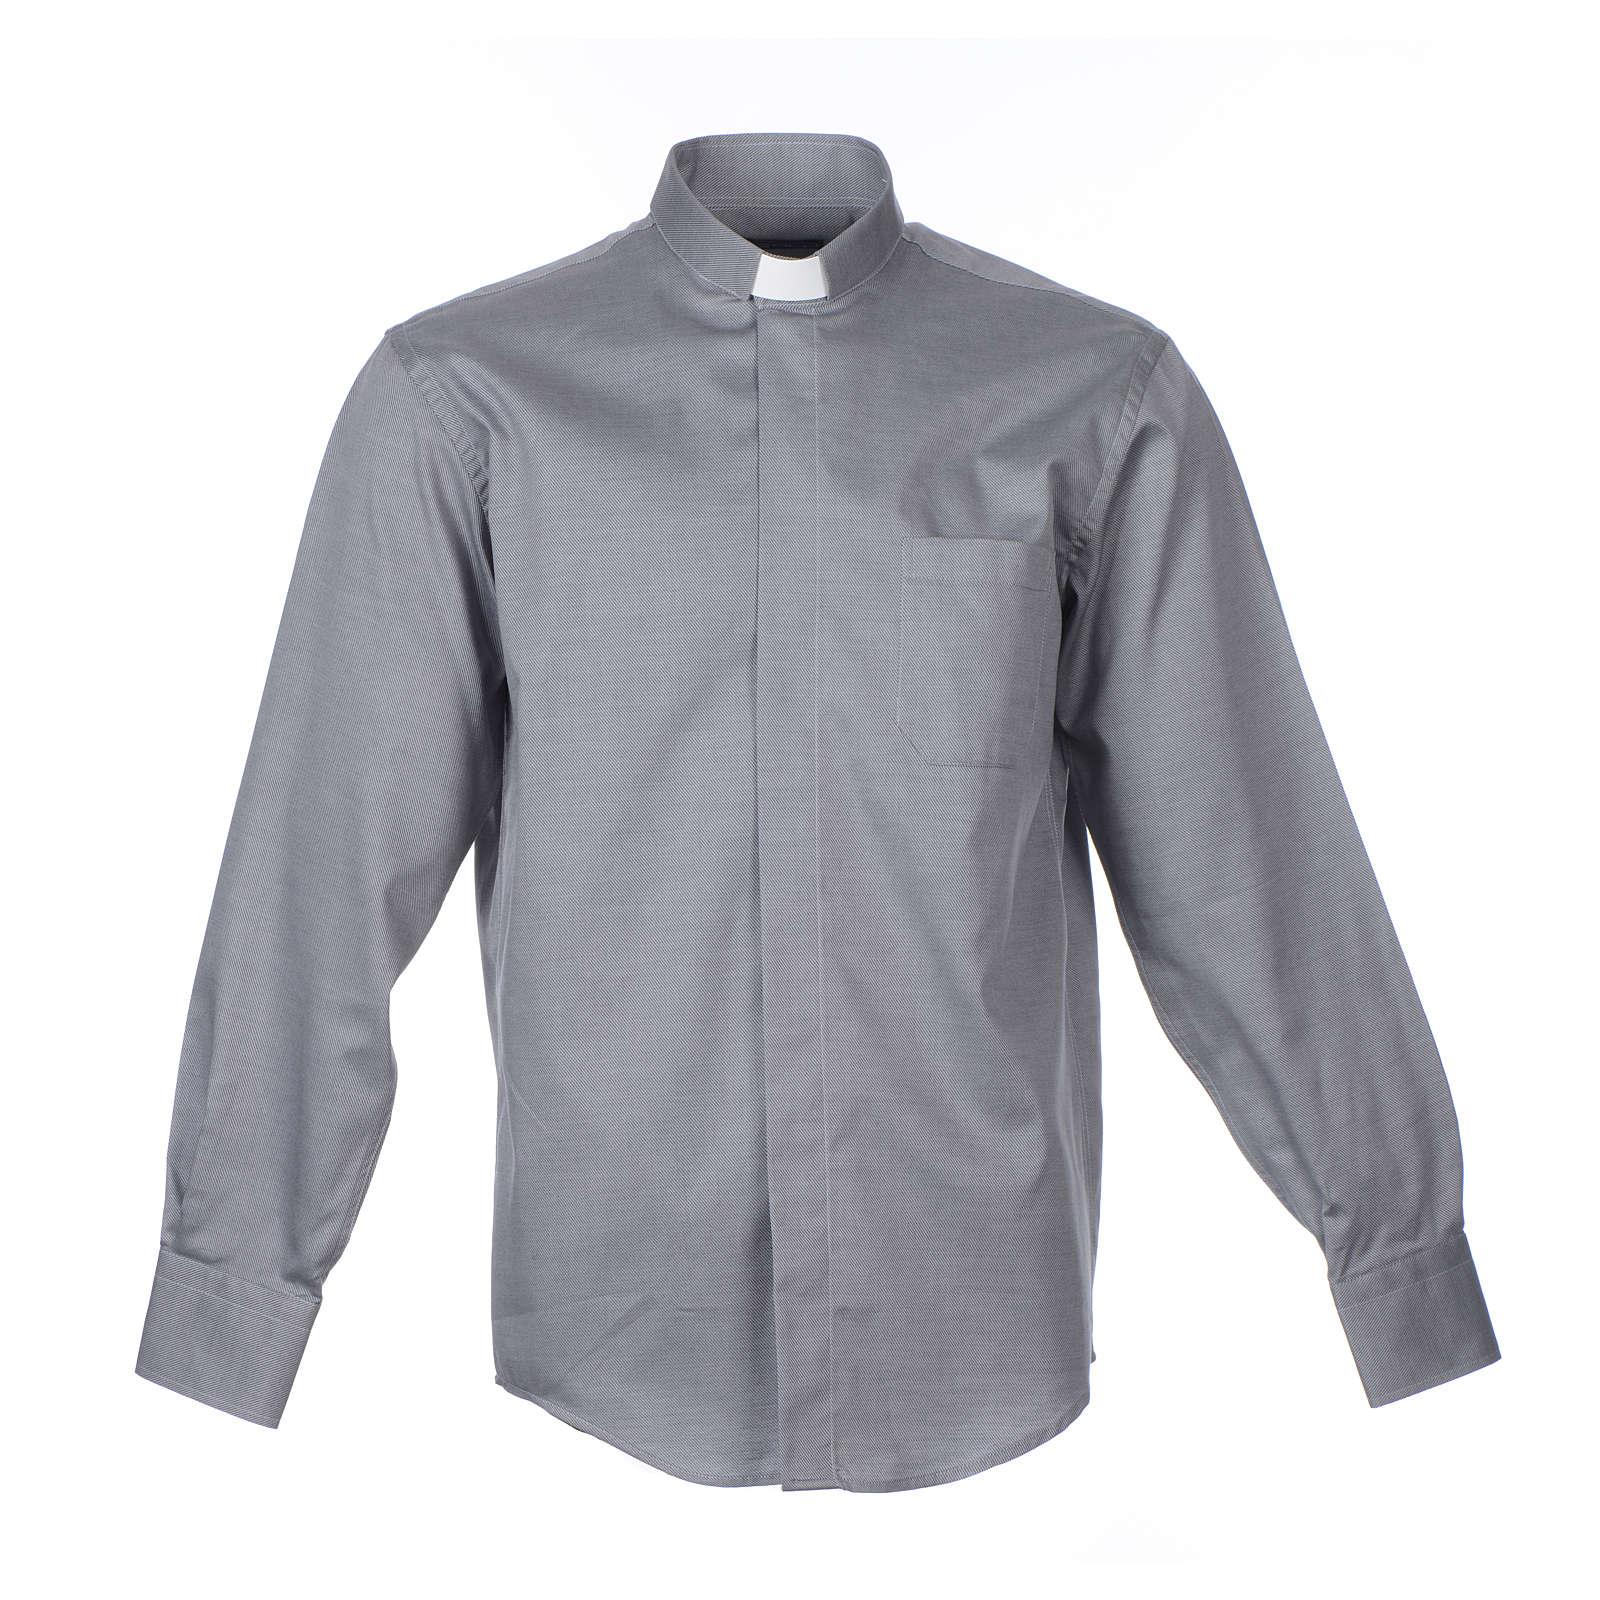 Camicia clergy M. Lunga Facile stiro Diagonale Misto cotone Grigio 4